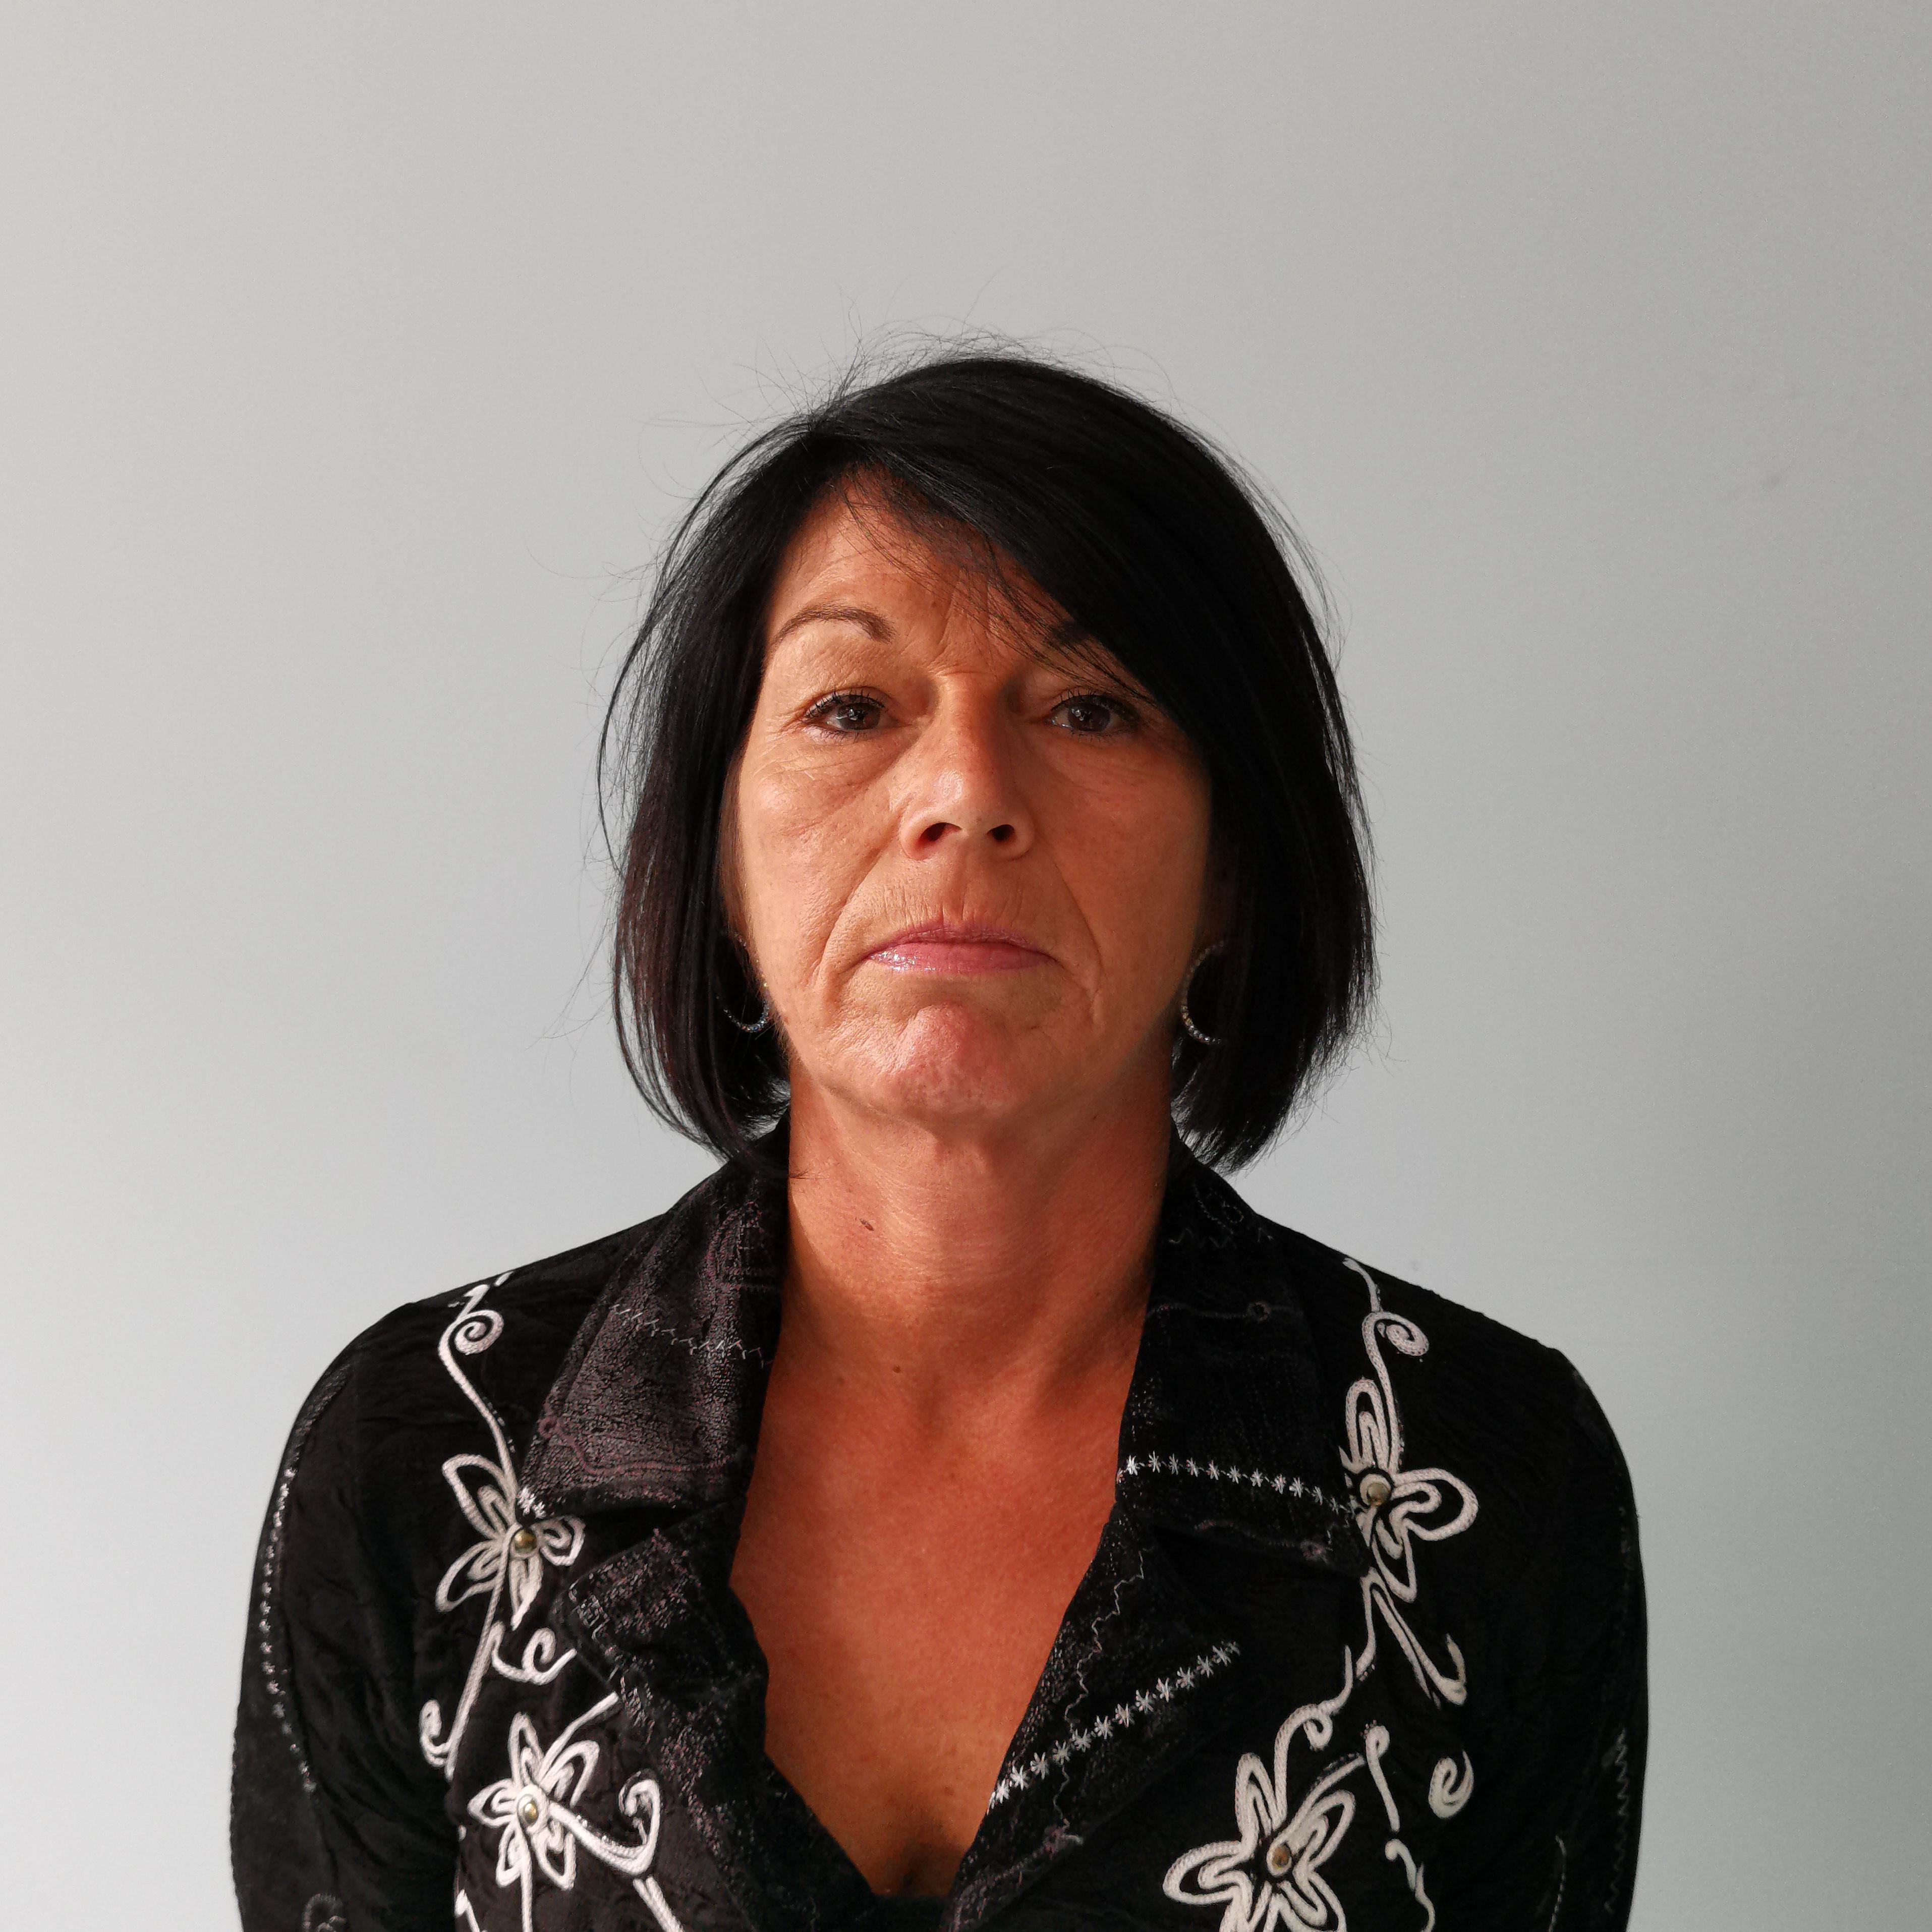 Élaine Lapointe